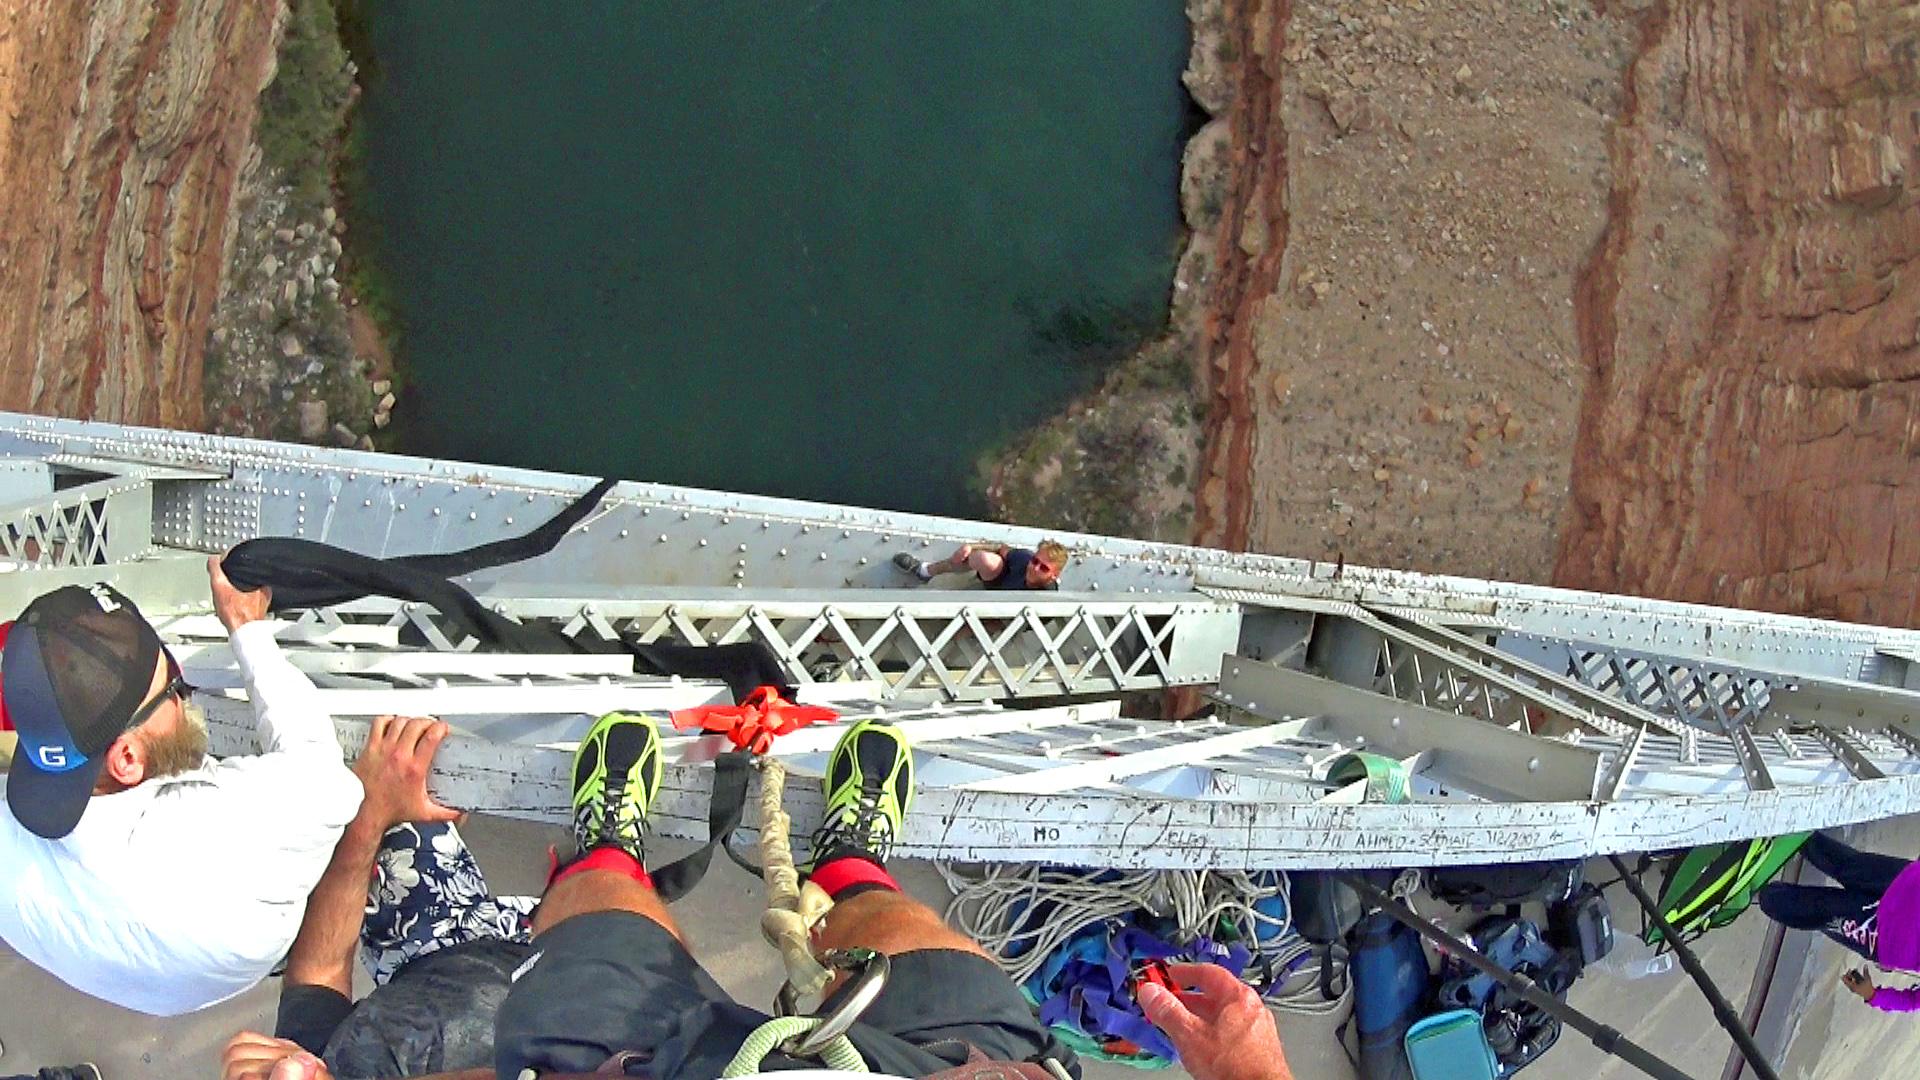 Navajo Bridge Bungee Jump - Grand Canyon - Arizona. Snapshot from my Sony Camera (POV video).